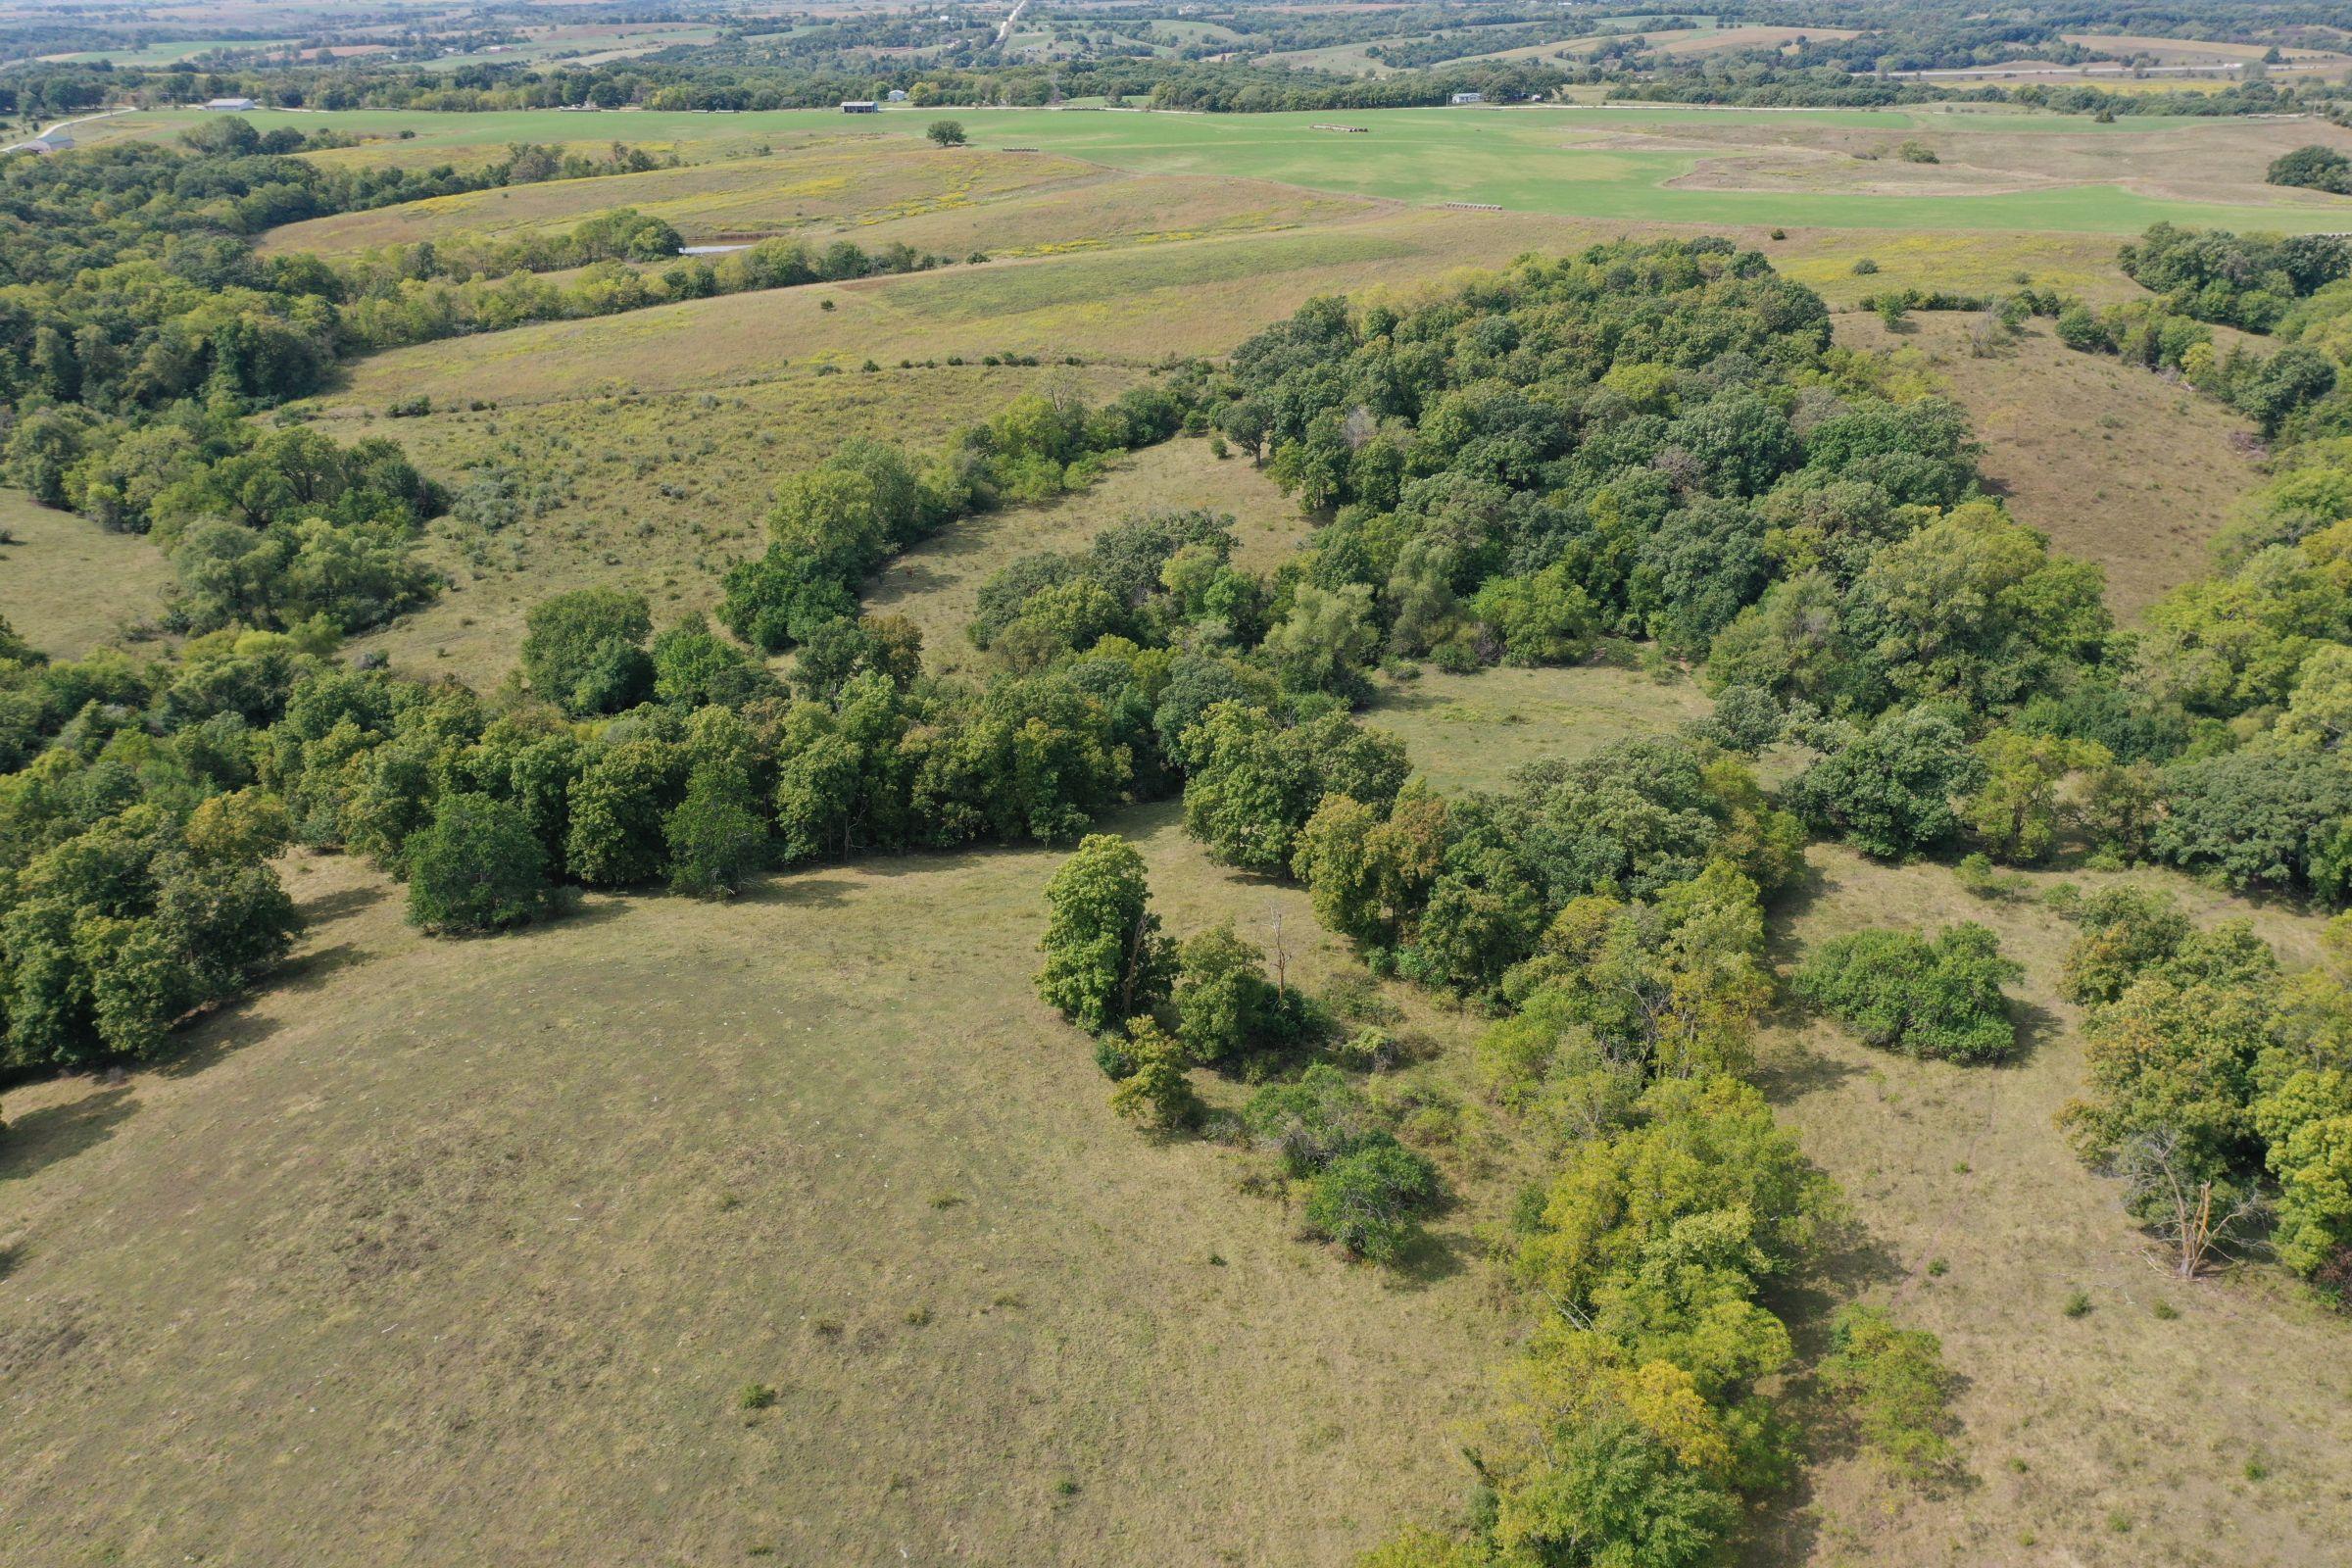 land-clarke-county-iowa-160-acres-listing-number-15173-5-2020-09-15-193131.jpg